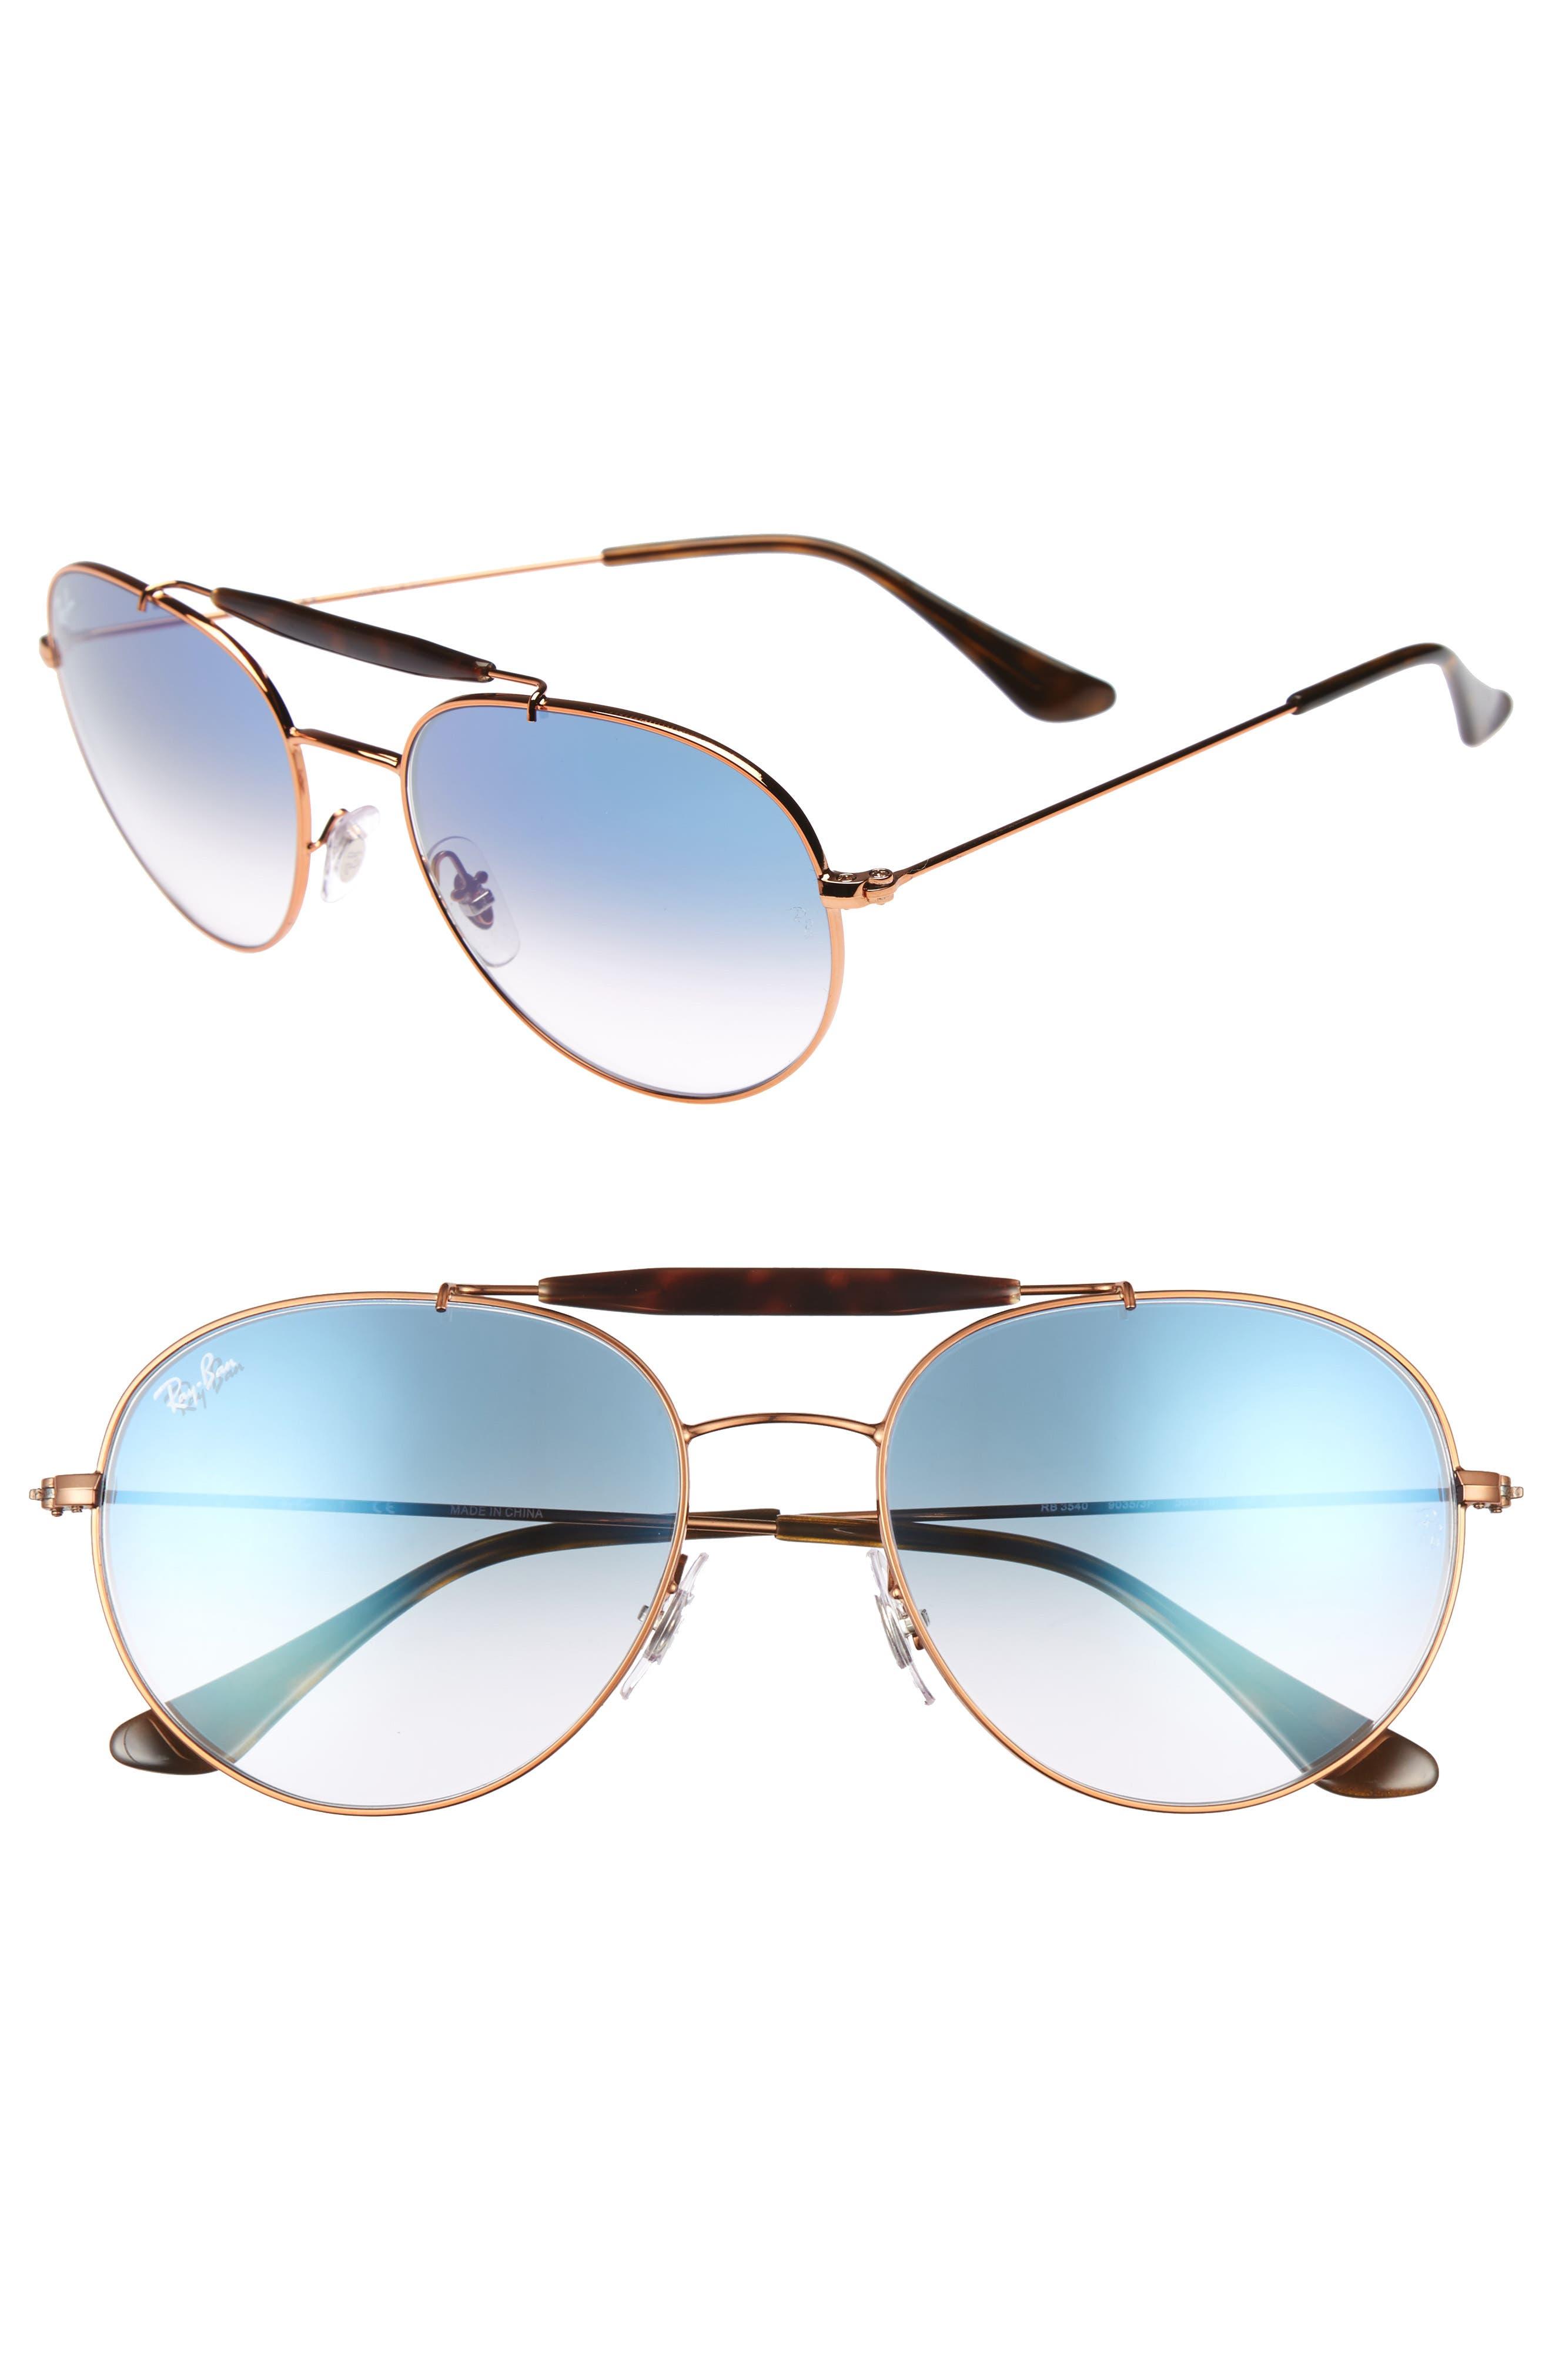 Highstreet 56mm Sunglasses,                         Main,                         color, 220